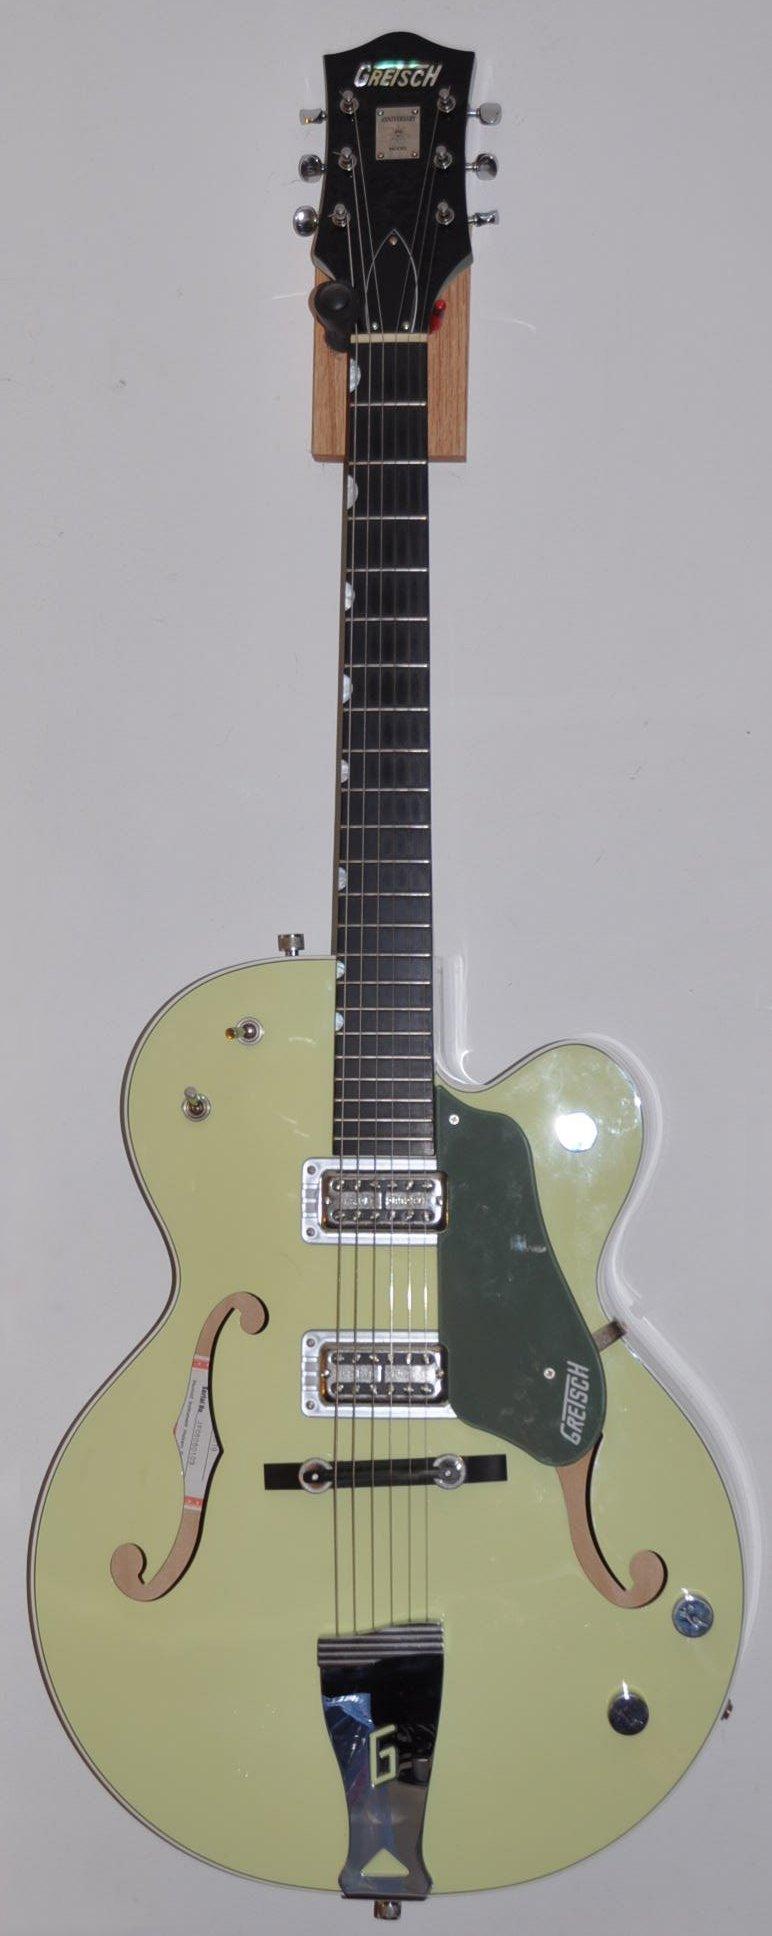 Terada Guitars-gretsch_6118-jpg